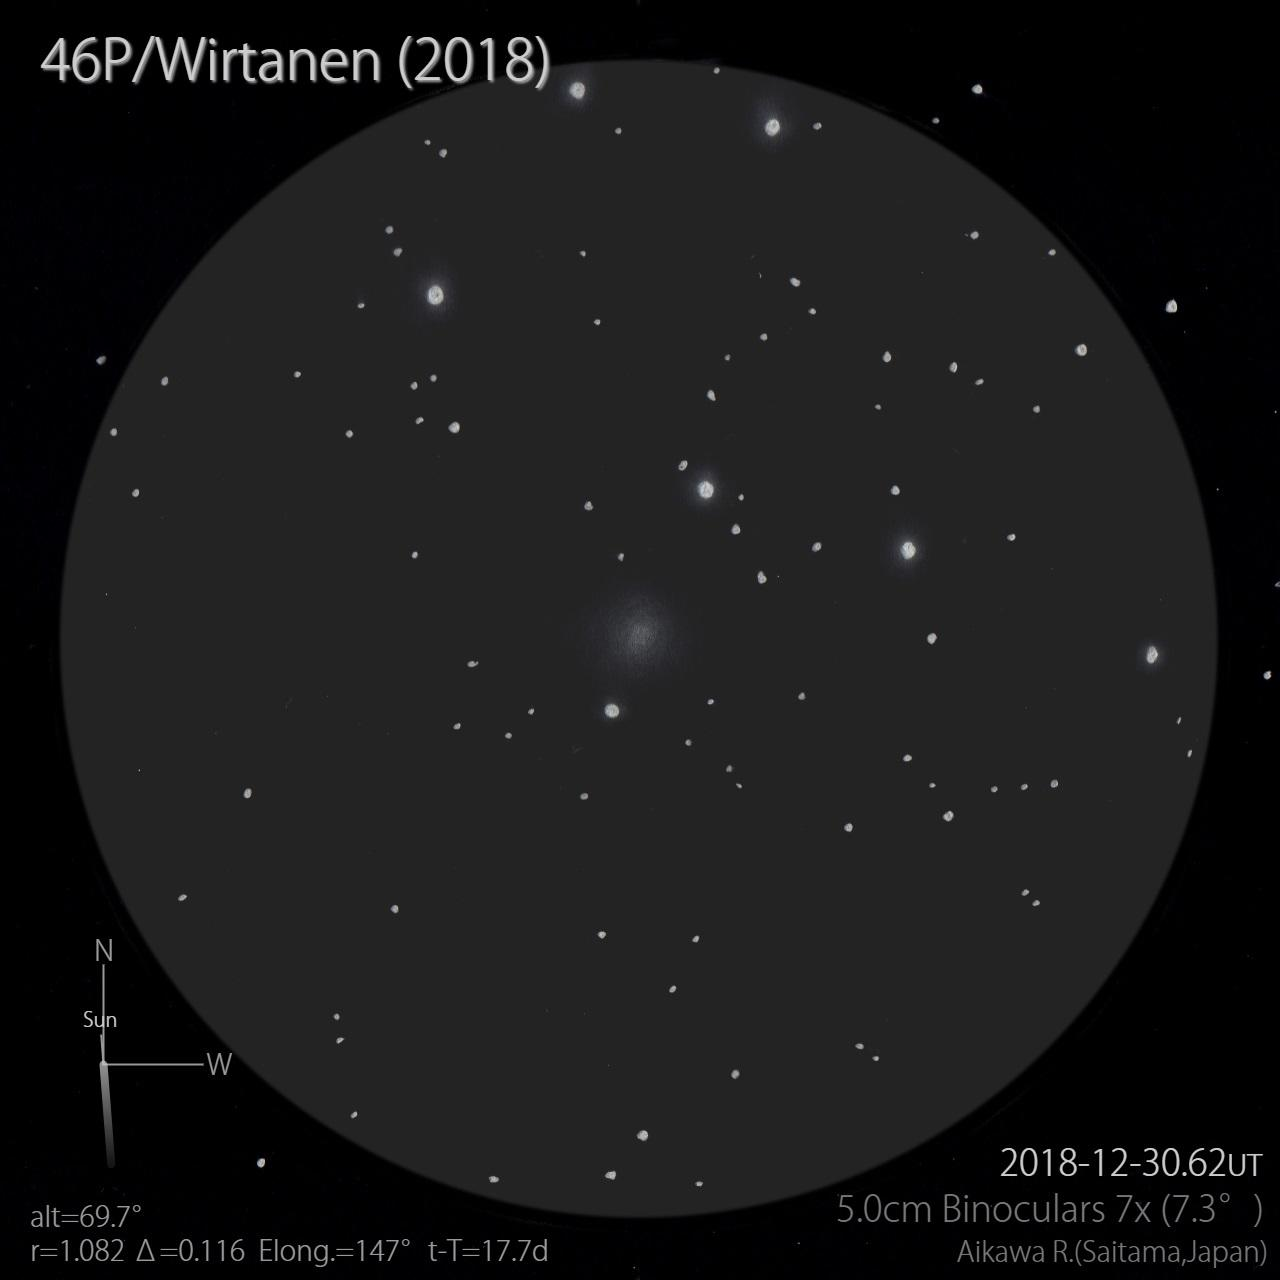 0046P-2018_012-editPosi-35-0.7.jpg